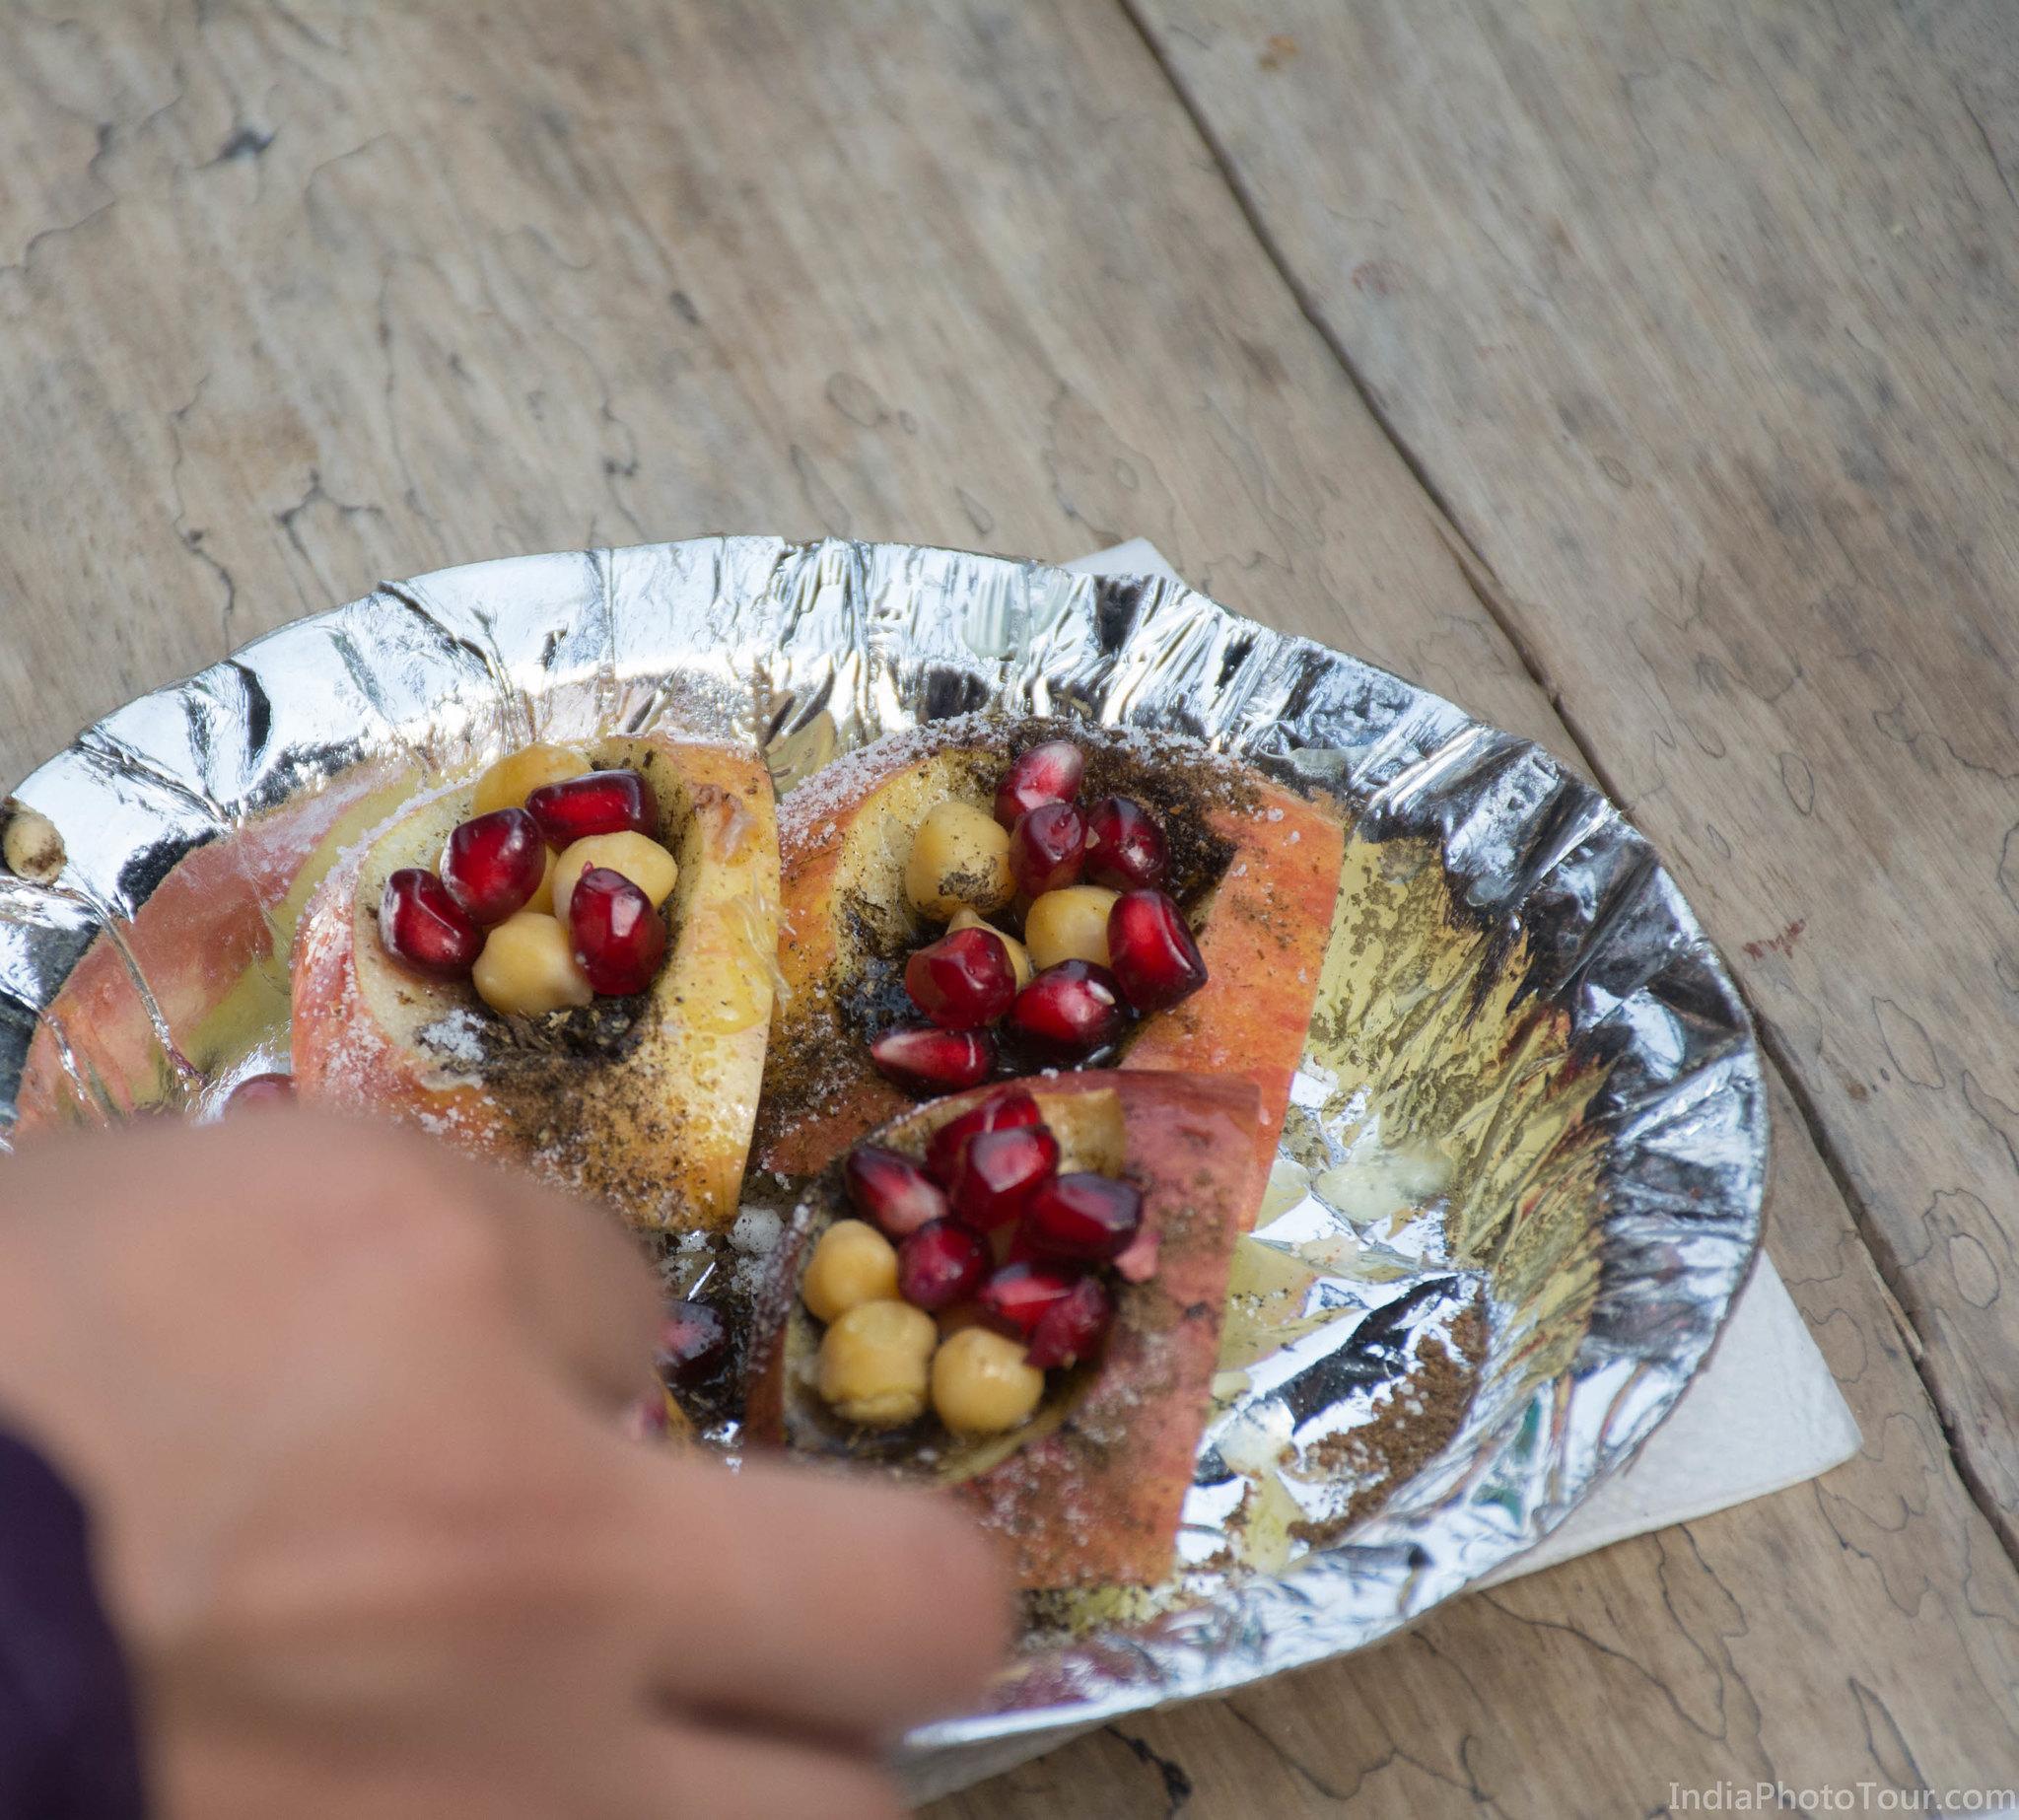 Close up shot of Kulia Chaat made with apples, powdered sugar, chaat masala chick peas, pomegranate and lemon juice